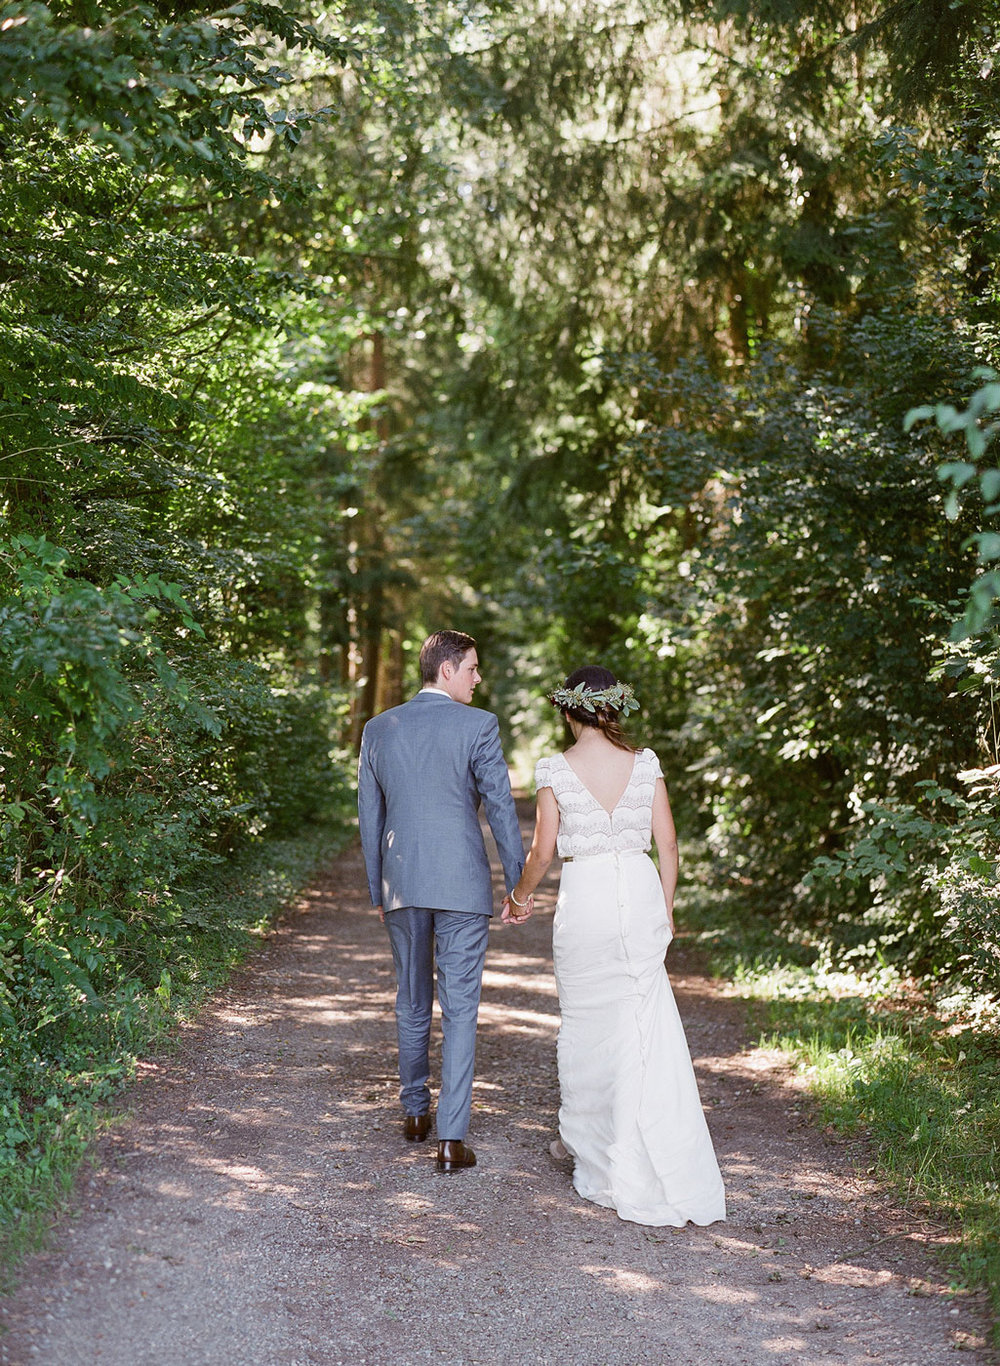 debi_flo_wedding_in_kartause_ittingen_20